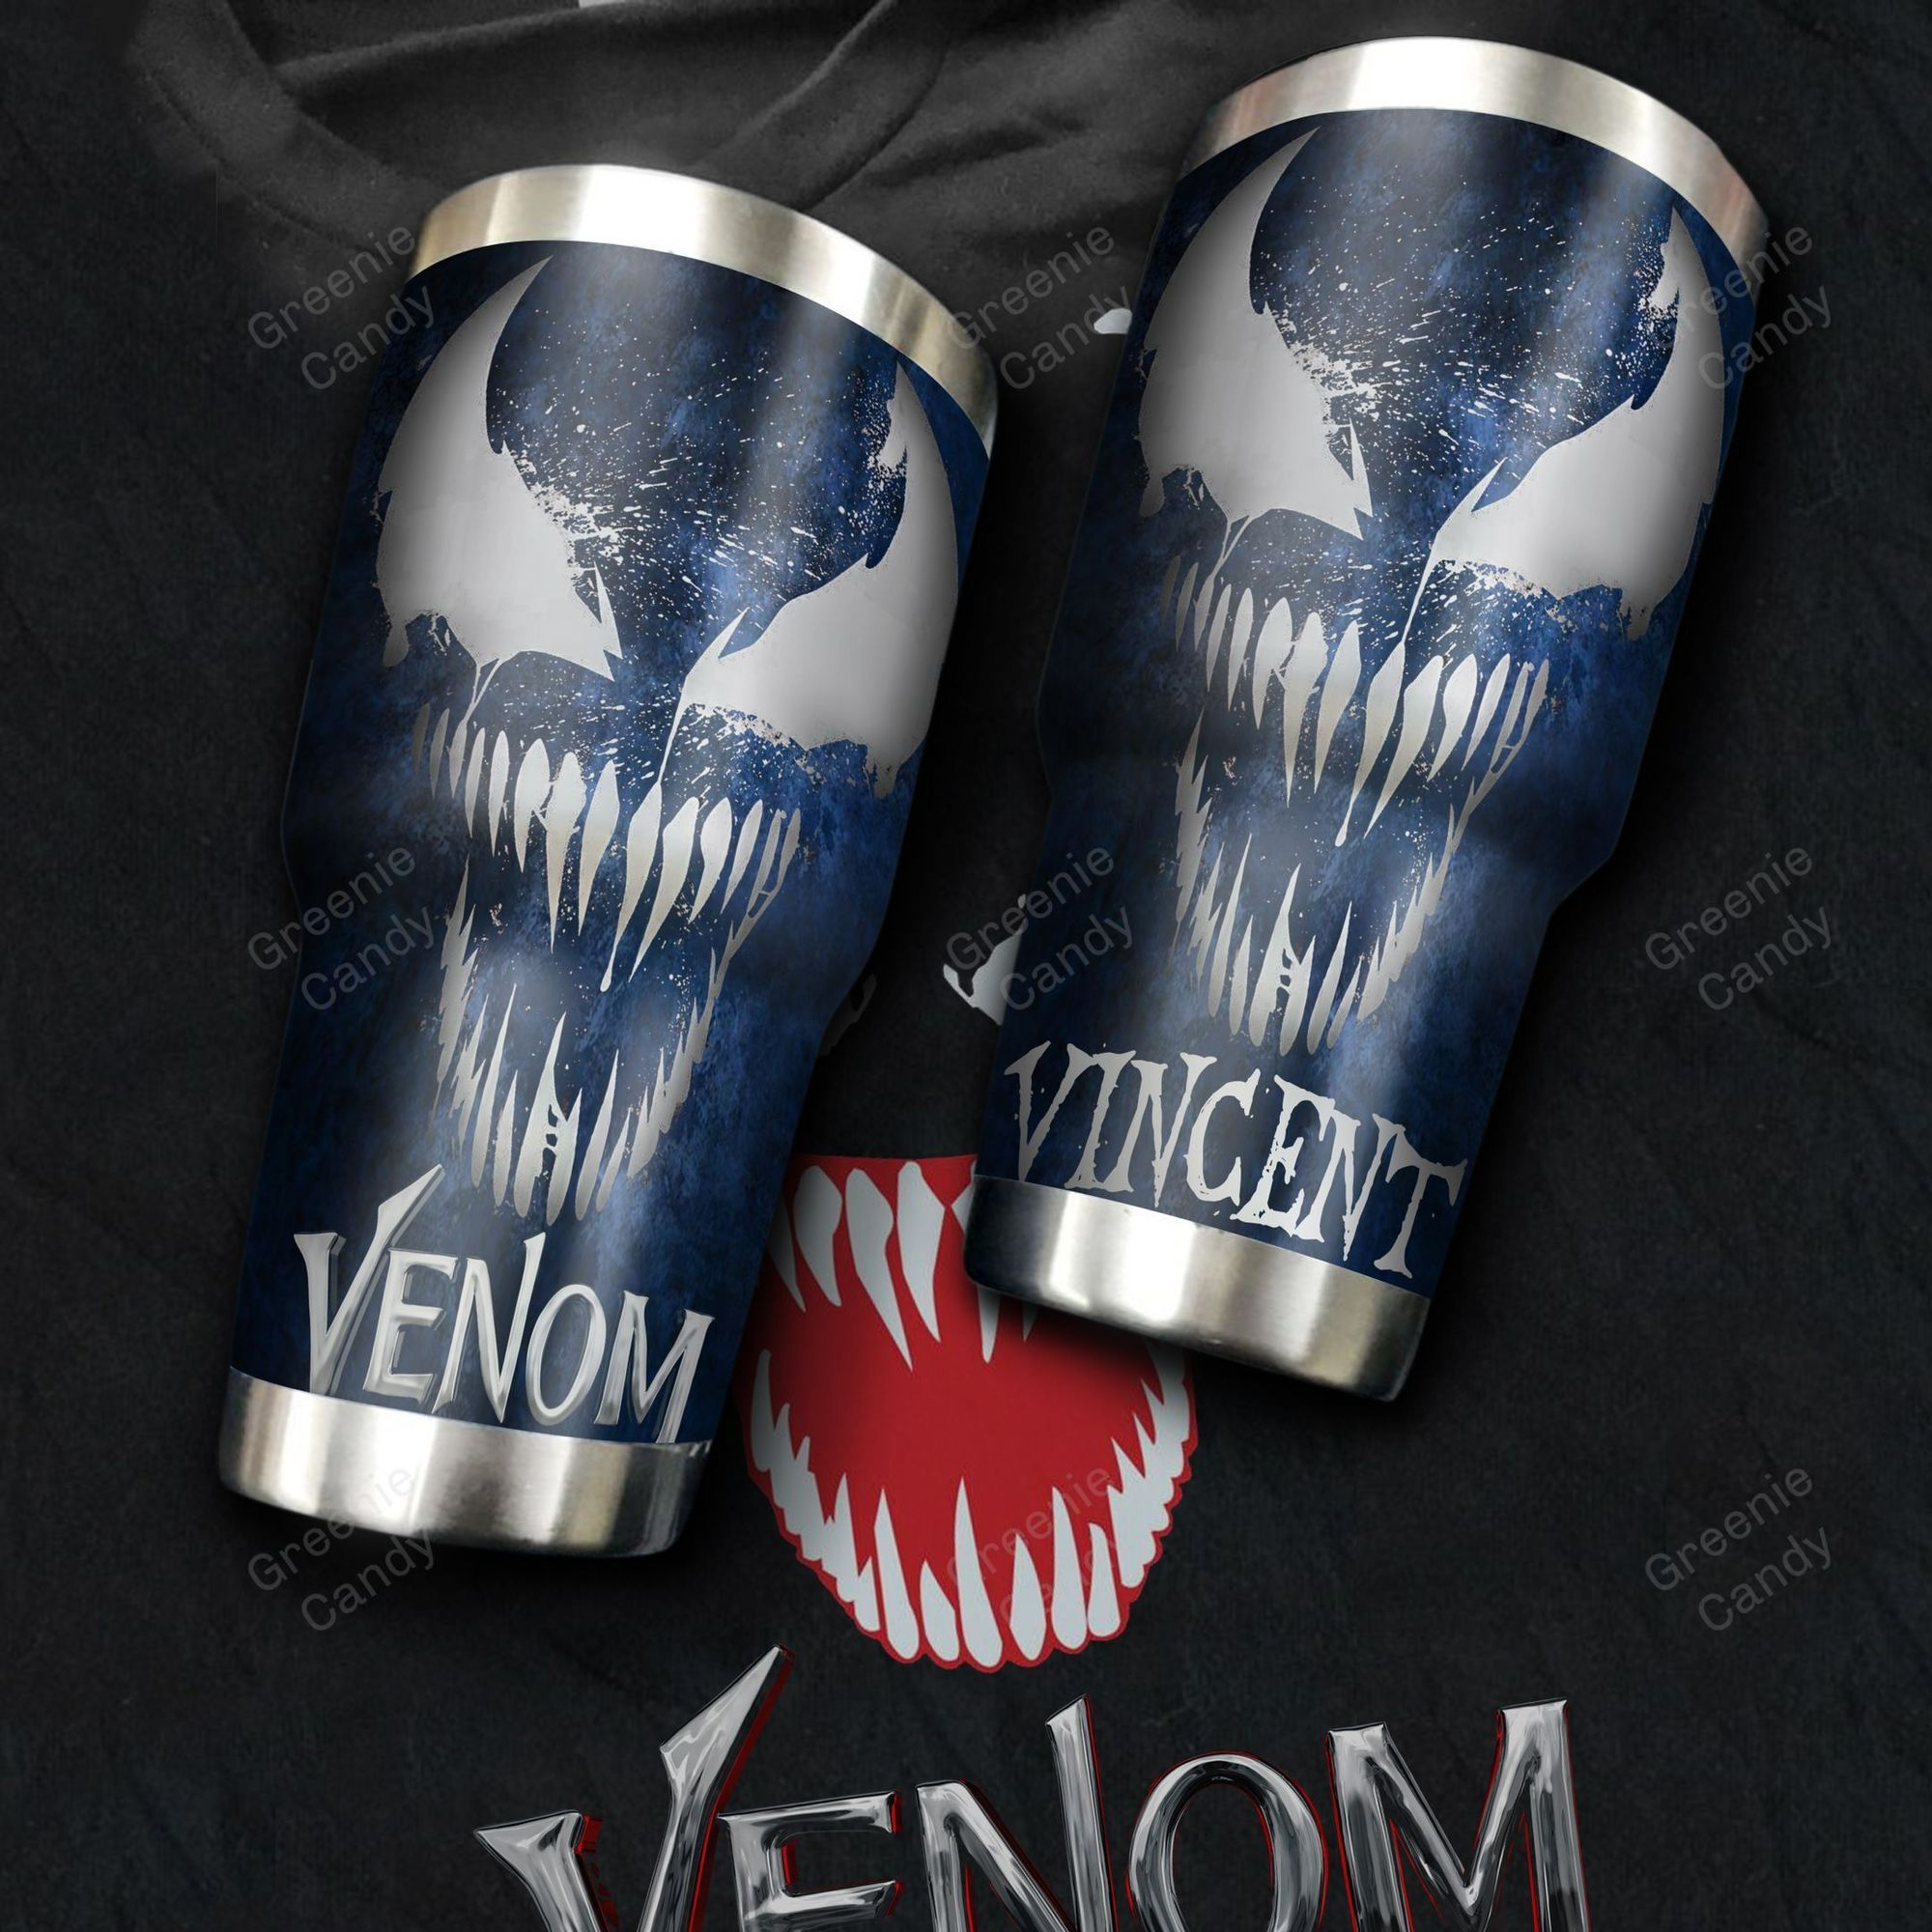 Personalized Venom Superhero Tumbler